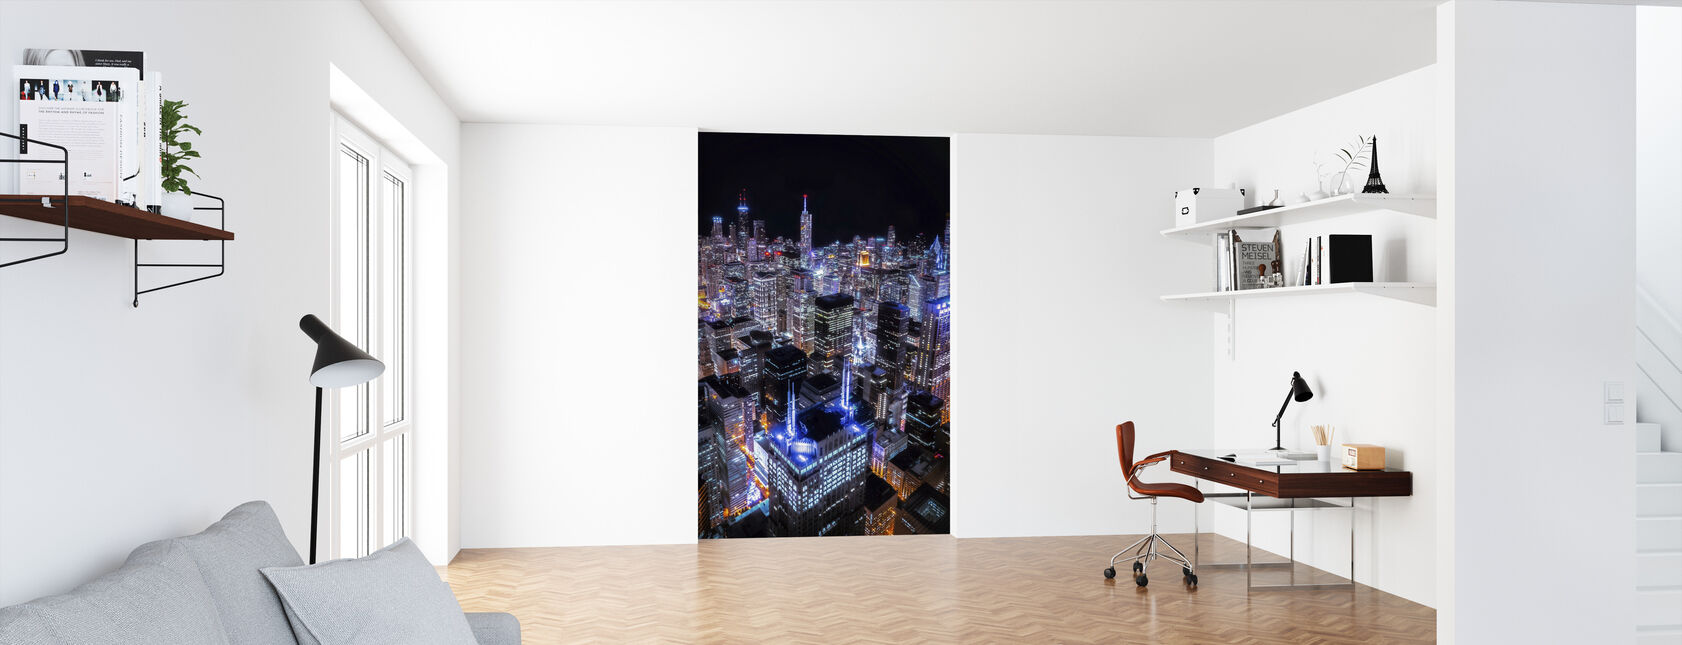 Chicago Night - Wallpaper - Office